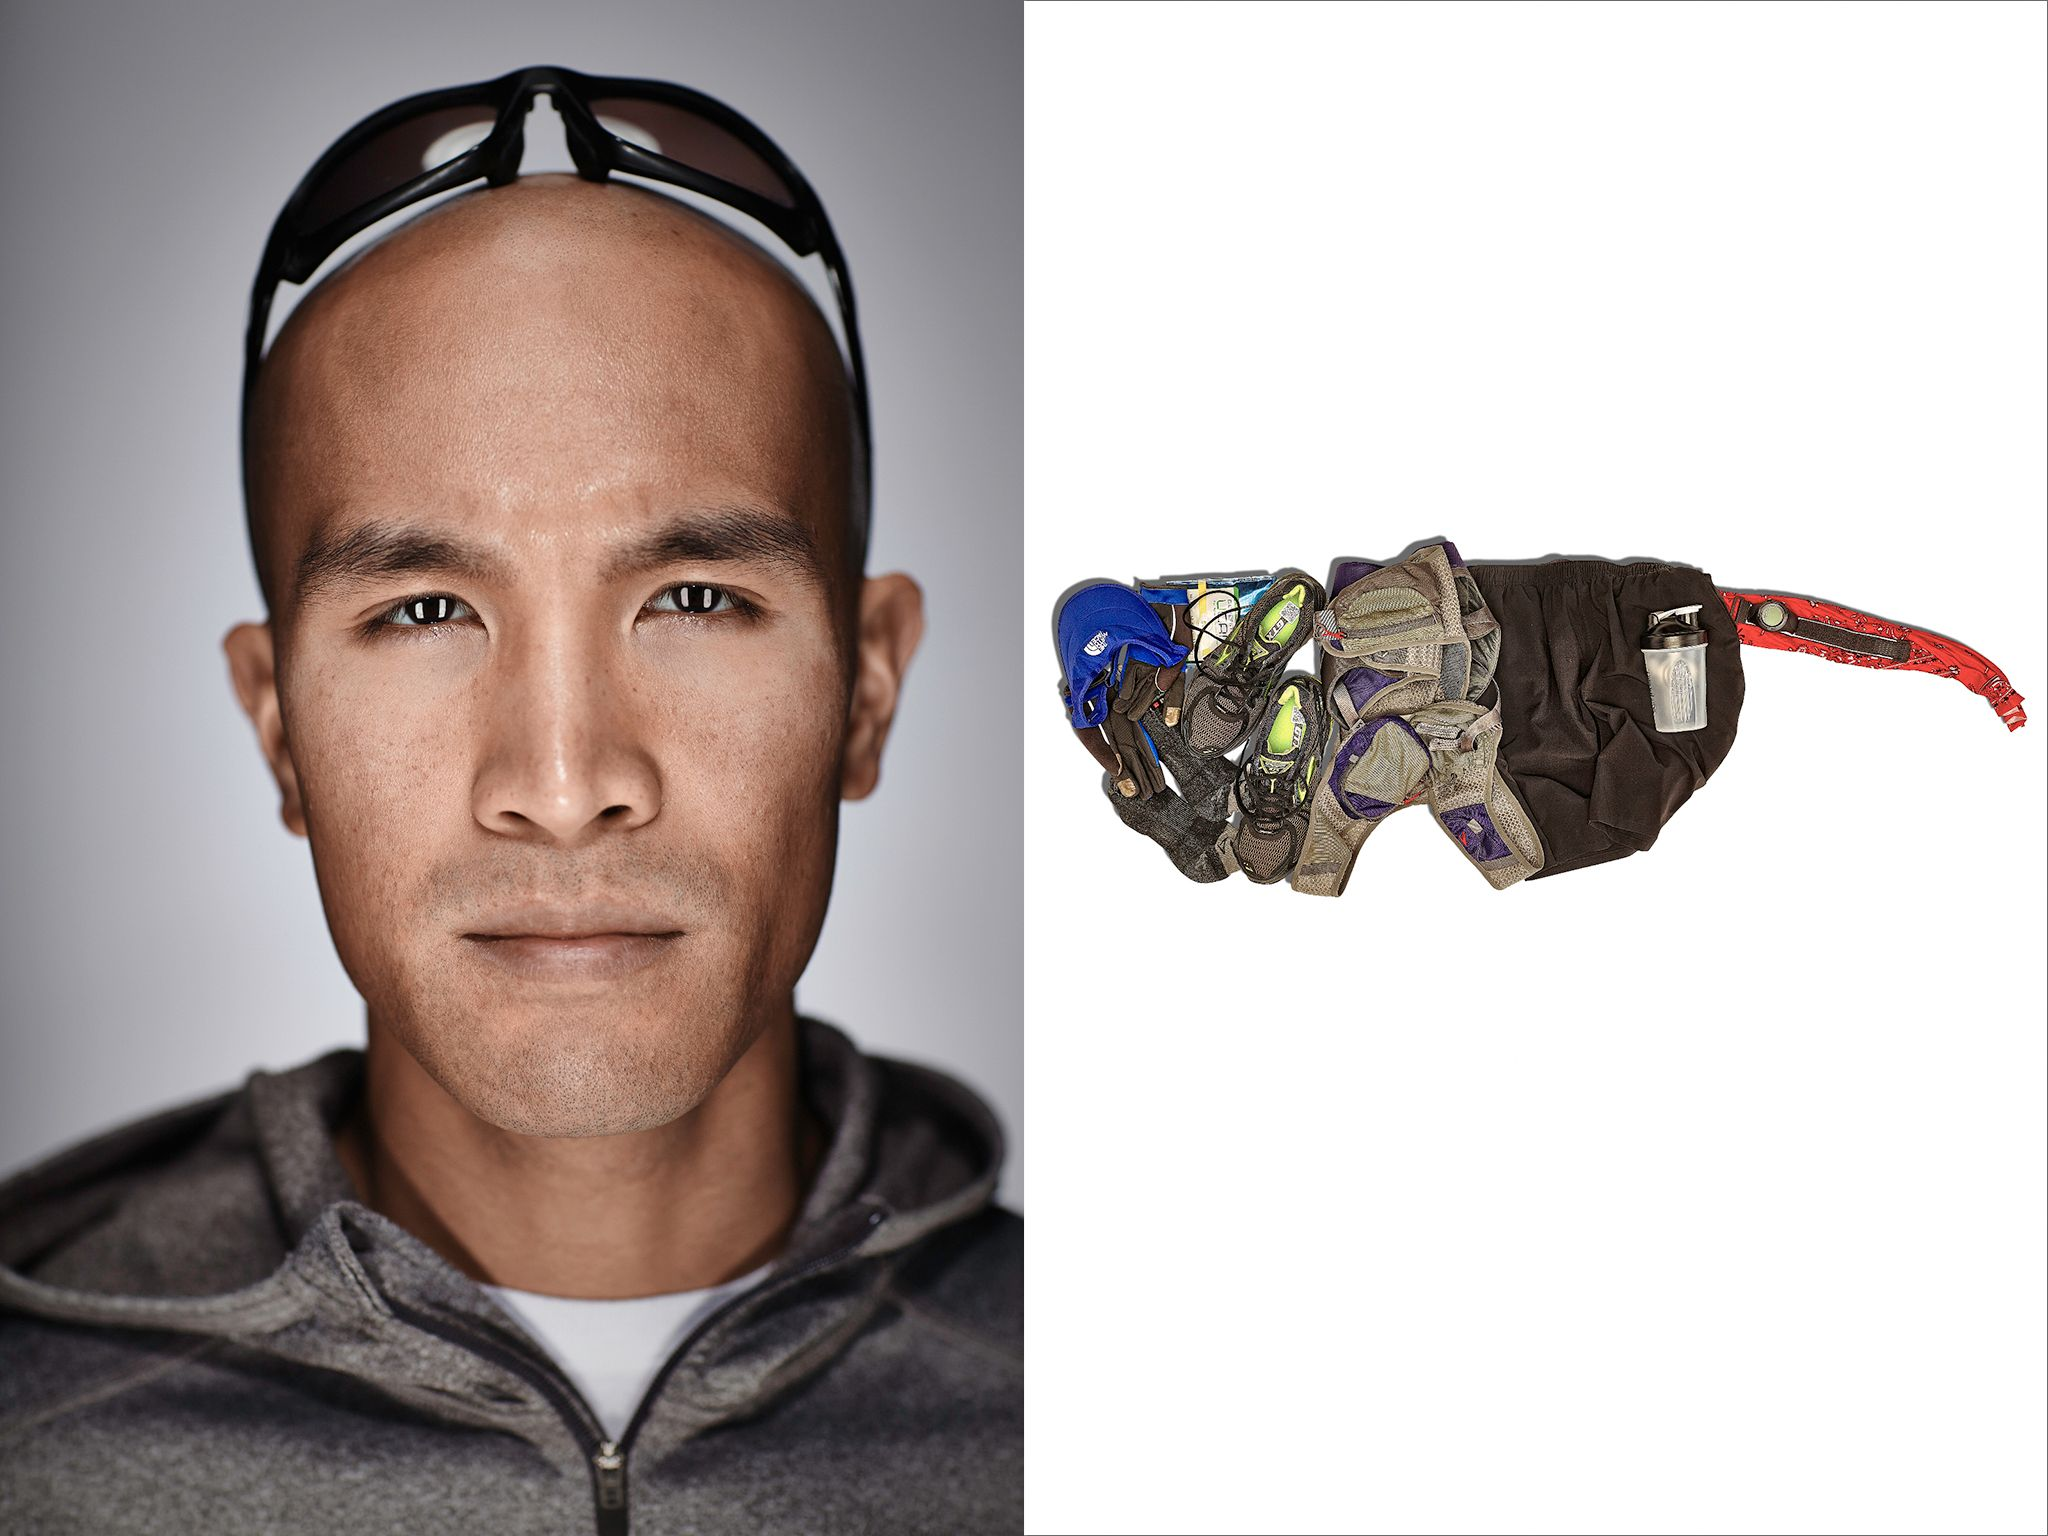 Pon Somnhot - Ultramarathon Man | Vance Jacobs Photography